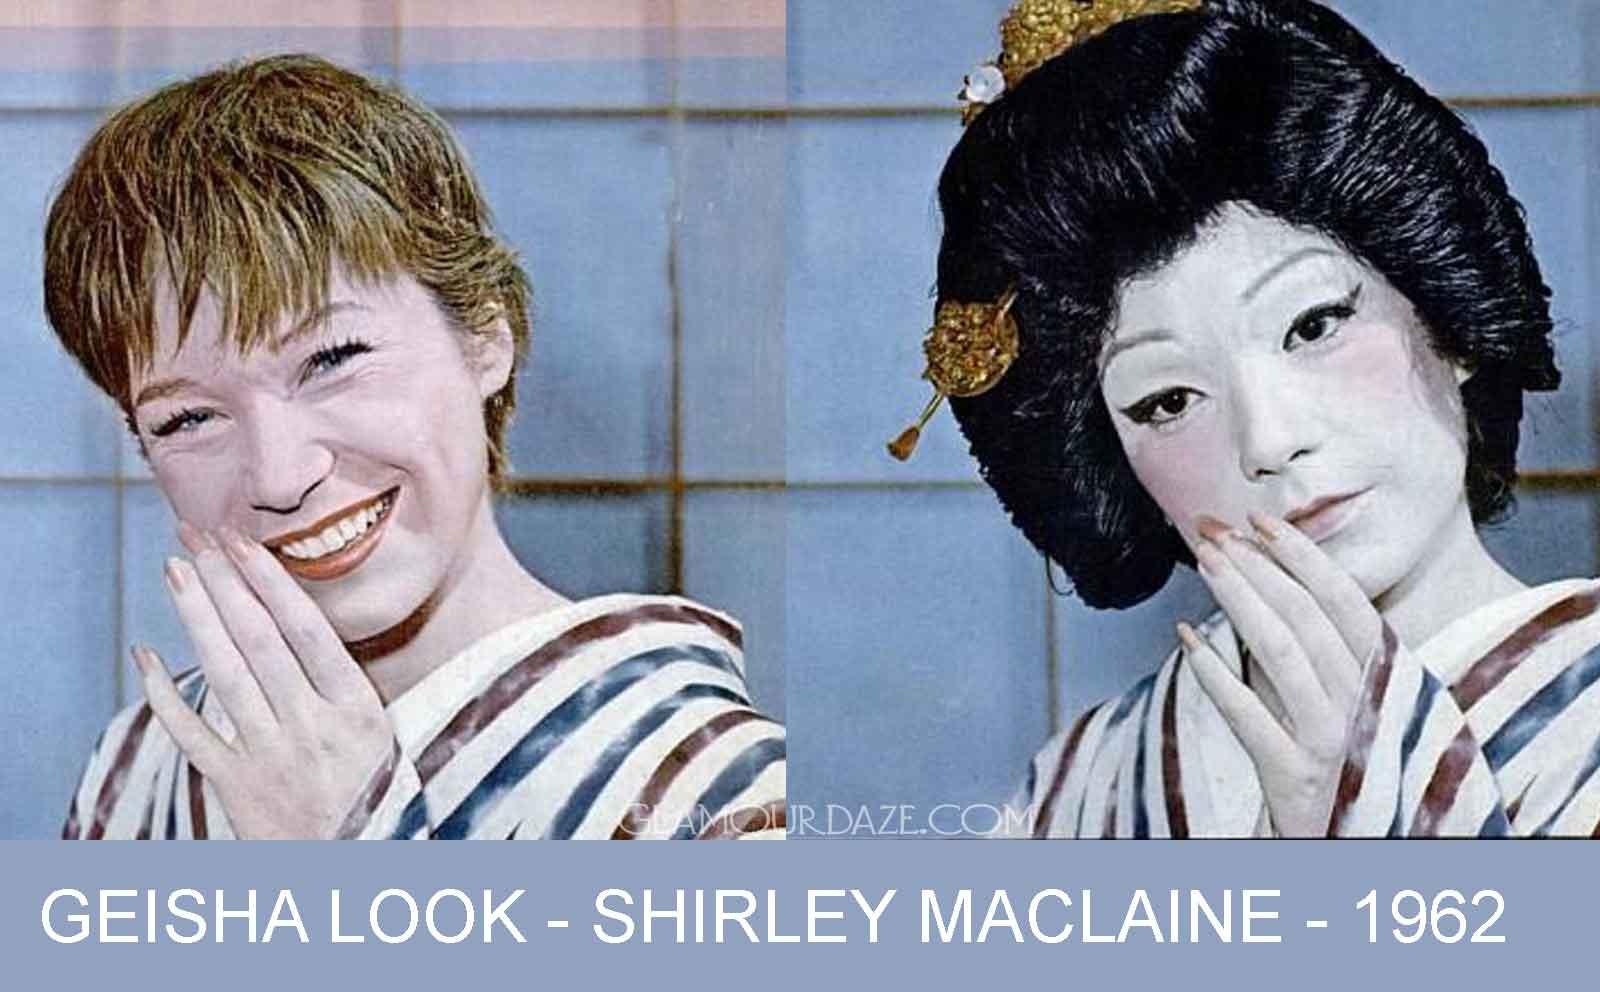 shirley maclaine transforms into a geisha – 1961 | glamourdaze